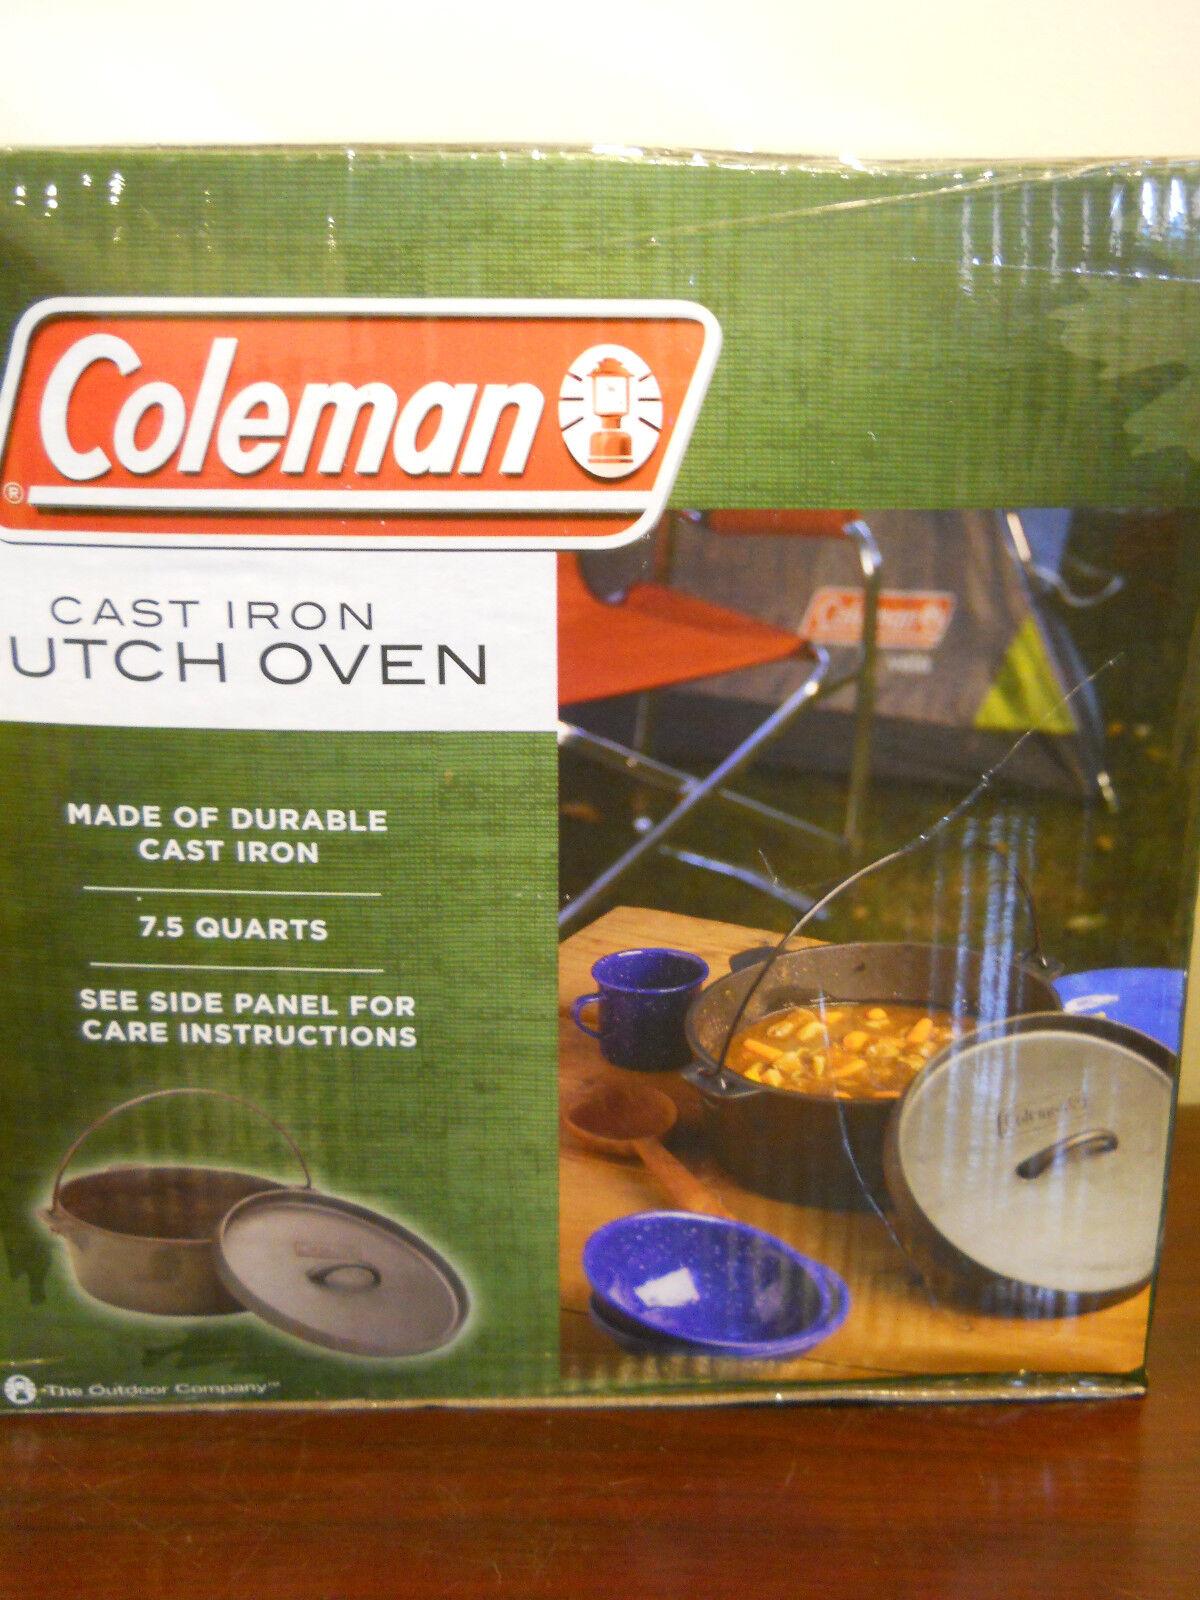 NEW COLEMAN CAMPING CAST IRON DUTCH OVEN POT LID 7.5 COOKWARE QT HANDLE COOKING COOKWARE 7.5 647970